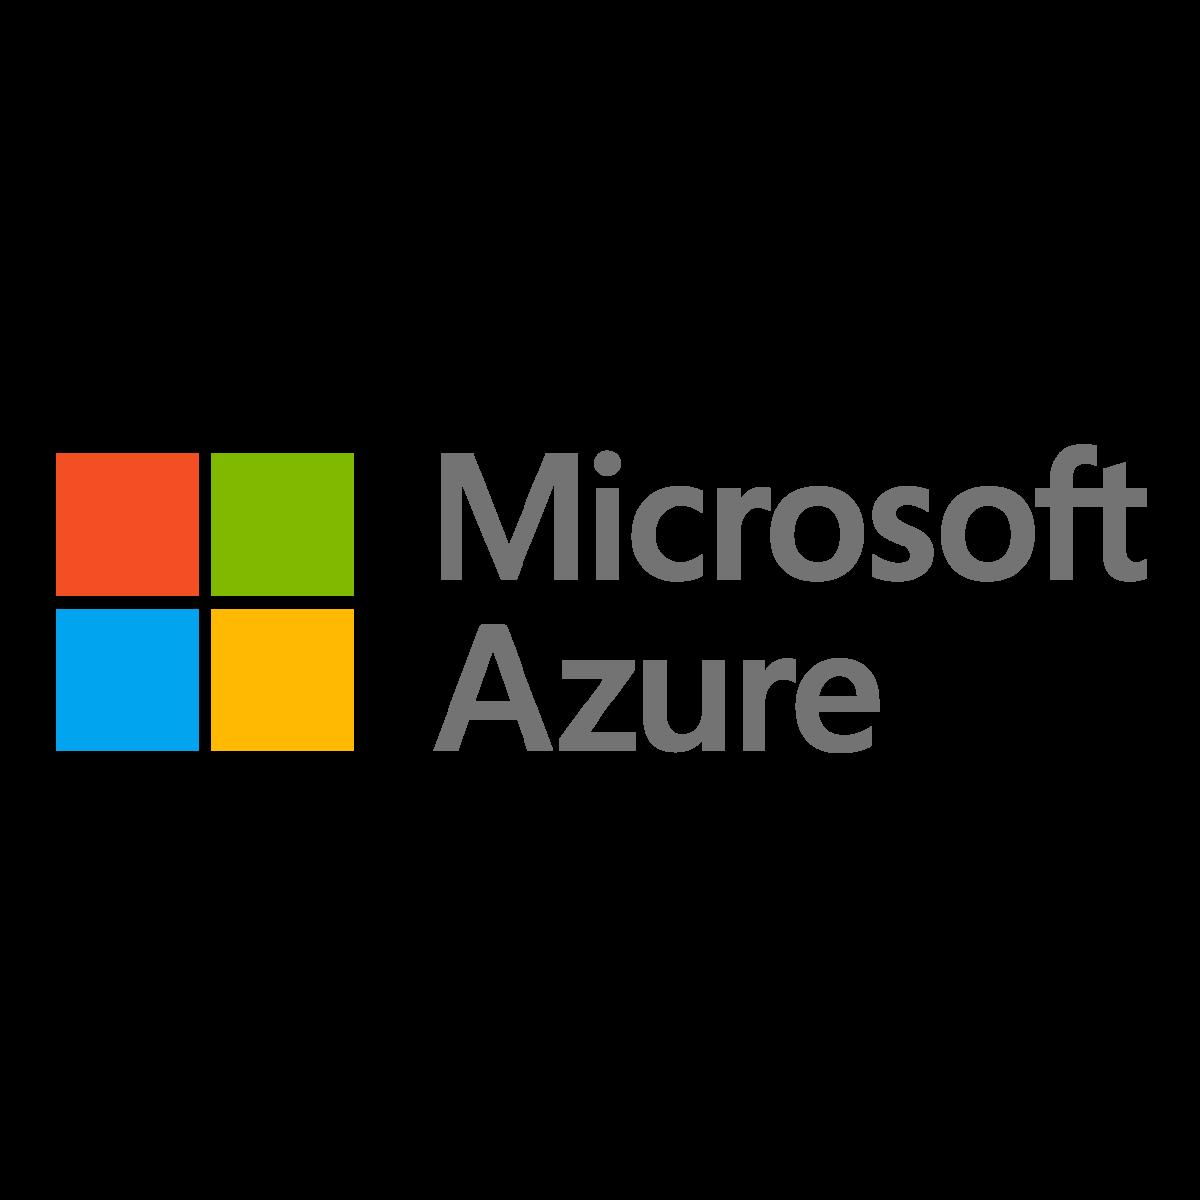 Microsoft Azure - 移动互联网出海,出海服务,海外的行业服务平台 - Enjoy出海